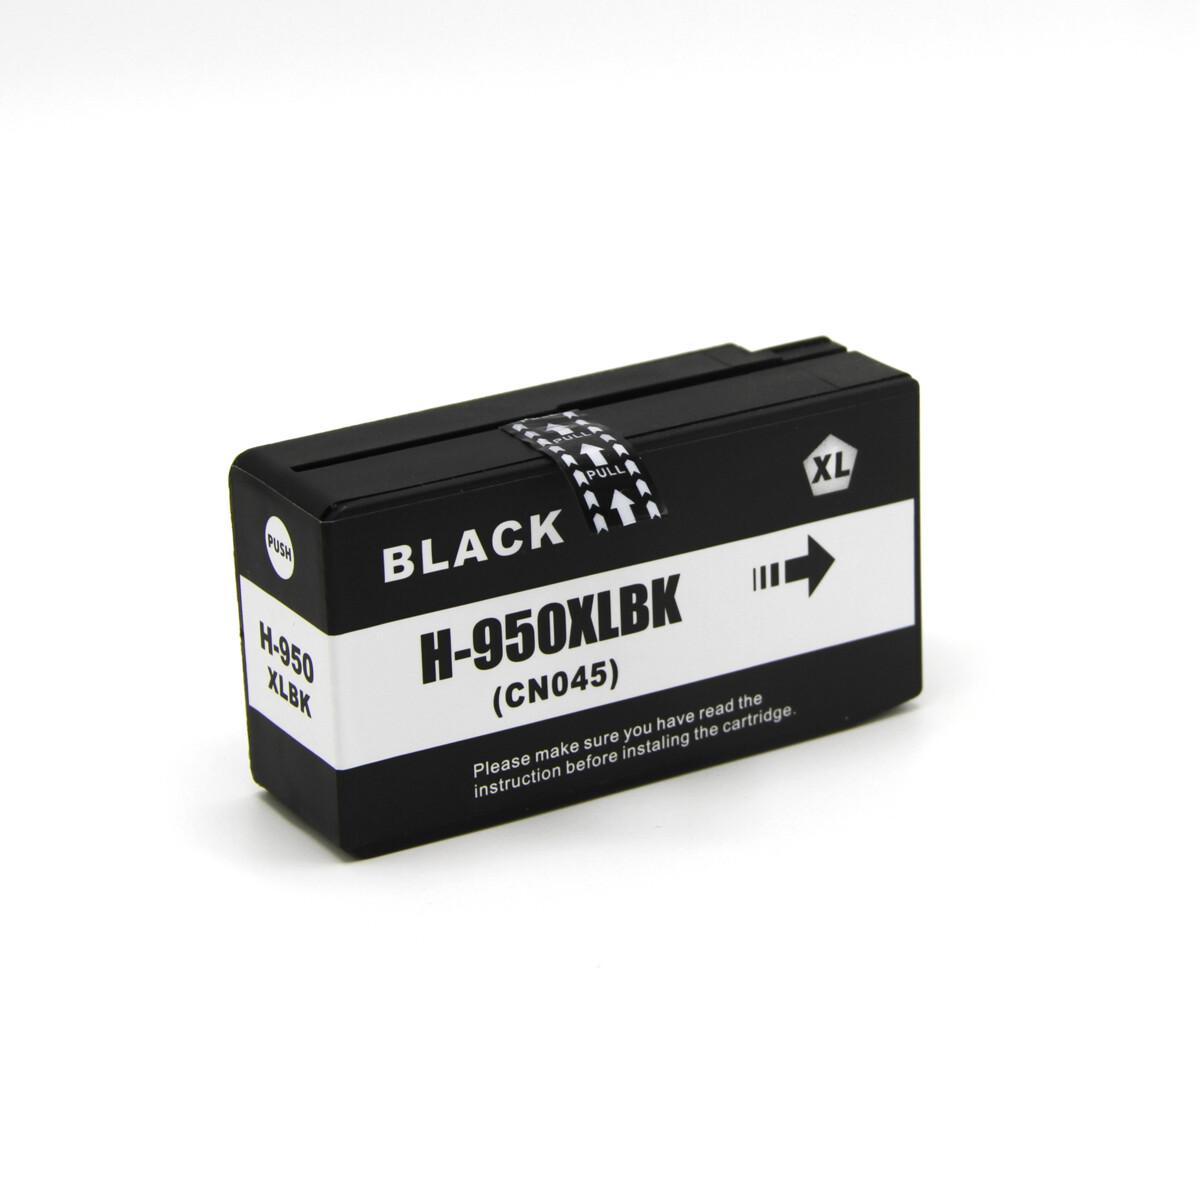 Tonery Náplně Cartridge HP 950XL, HP CN045A kompatibilná kazeta s čipom (Čierna)